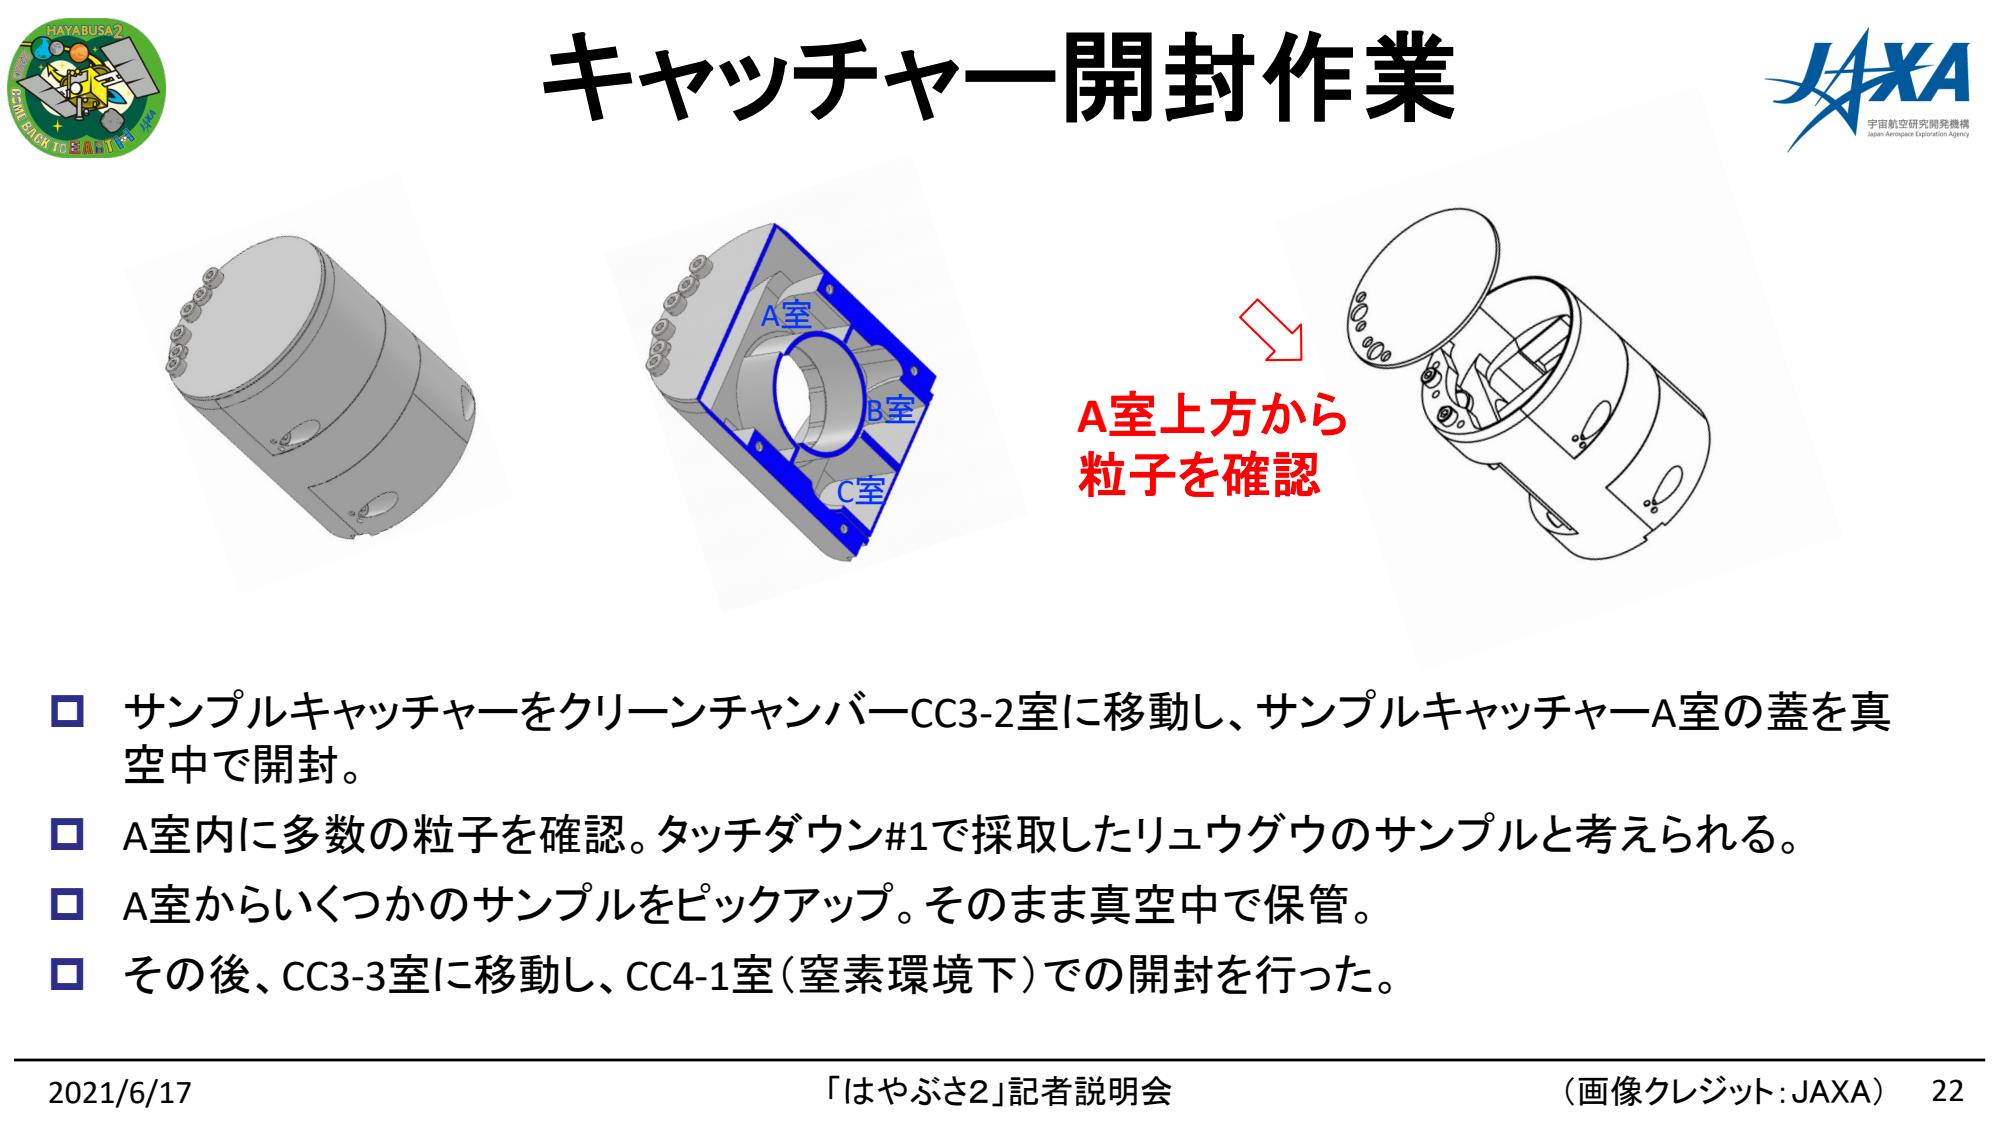 f:id:Imamura:20210617130340p:plain